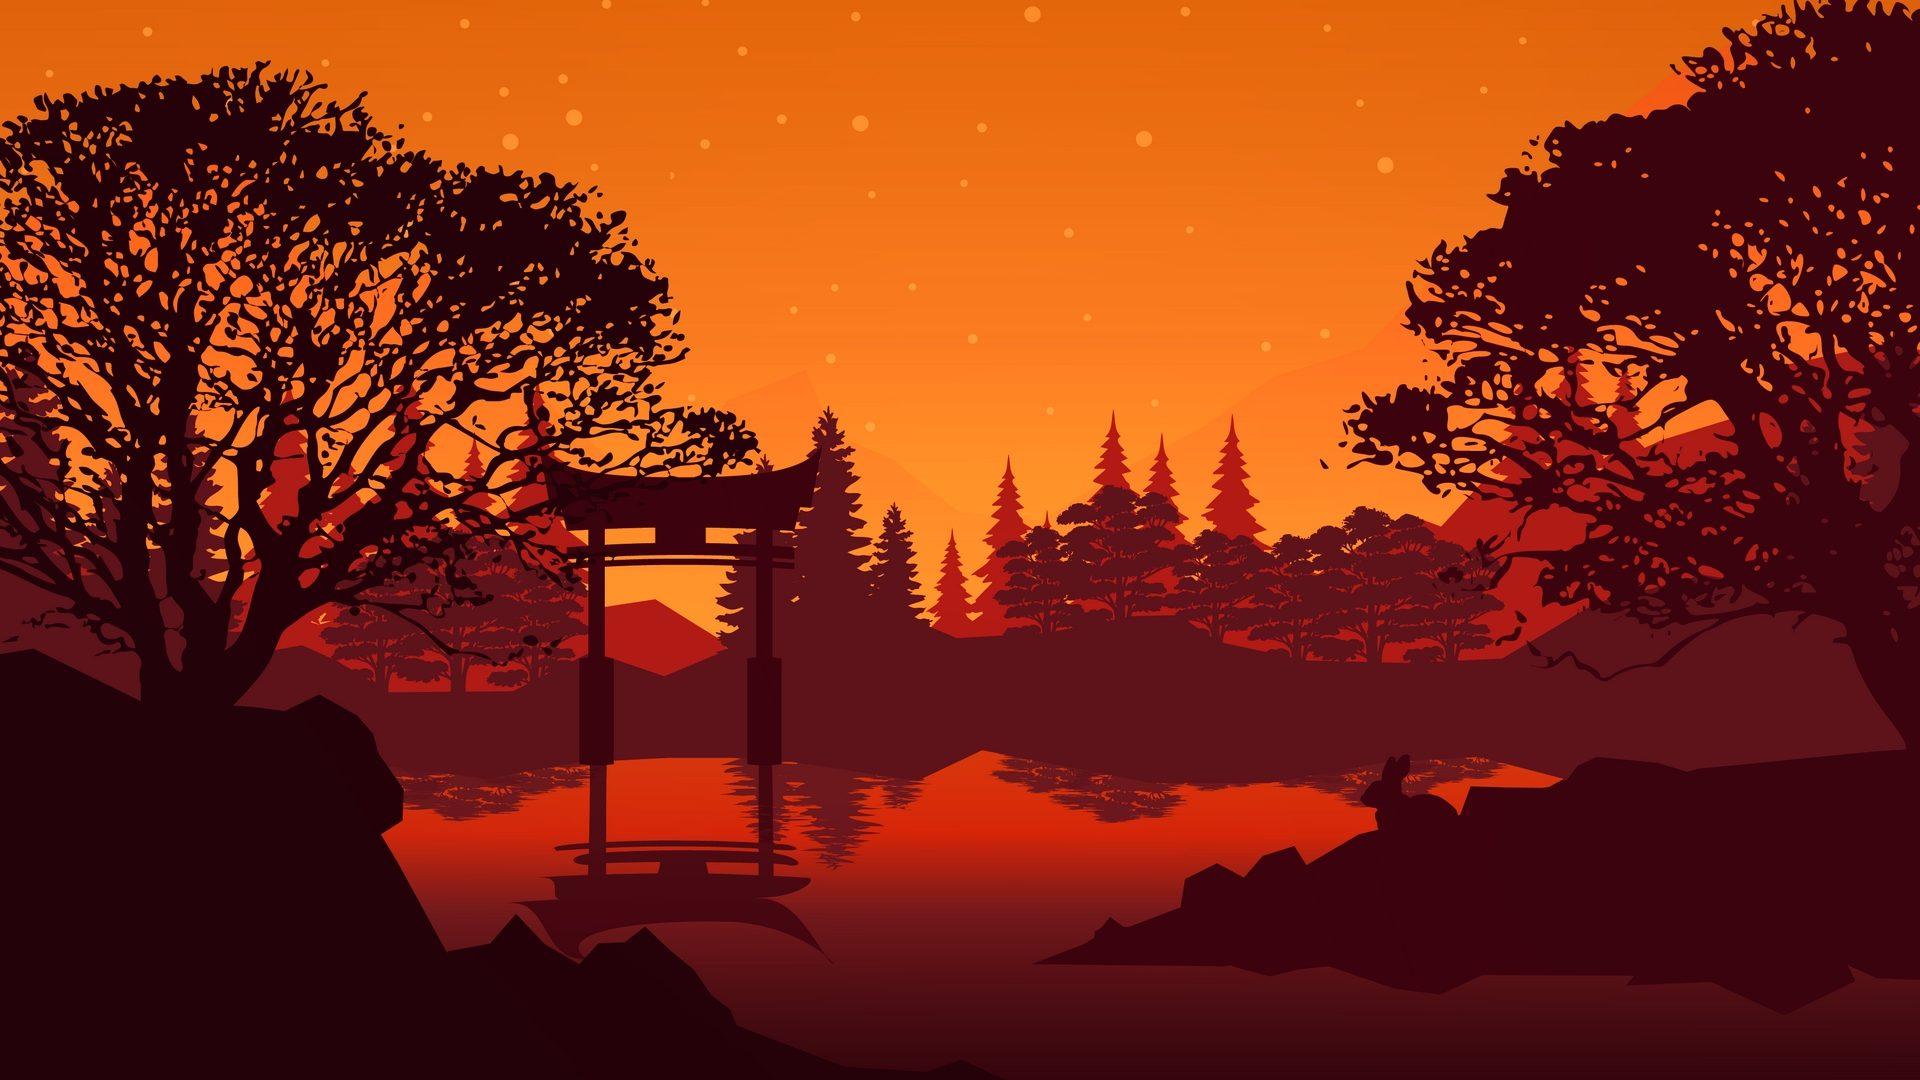 Torii gate miyajima wallpaper   HD Wallpapers Stores 1920x1080